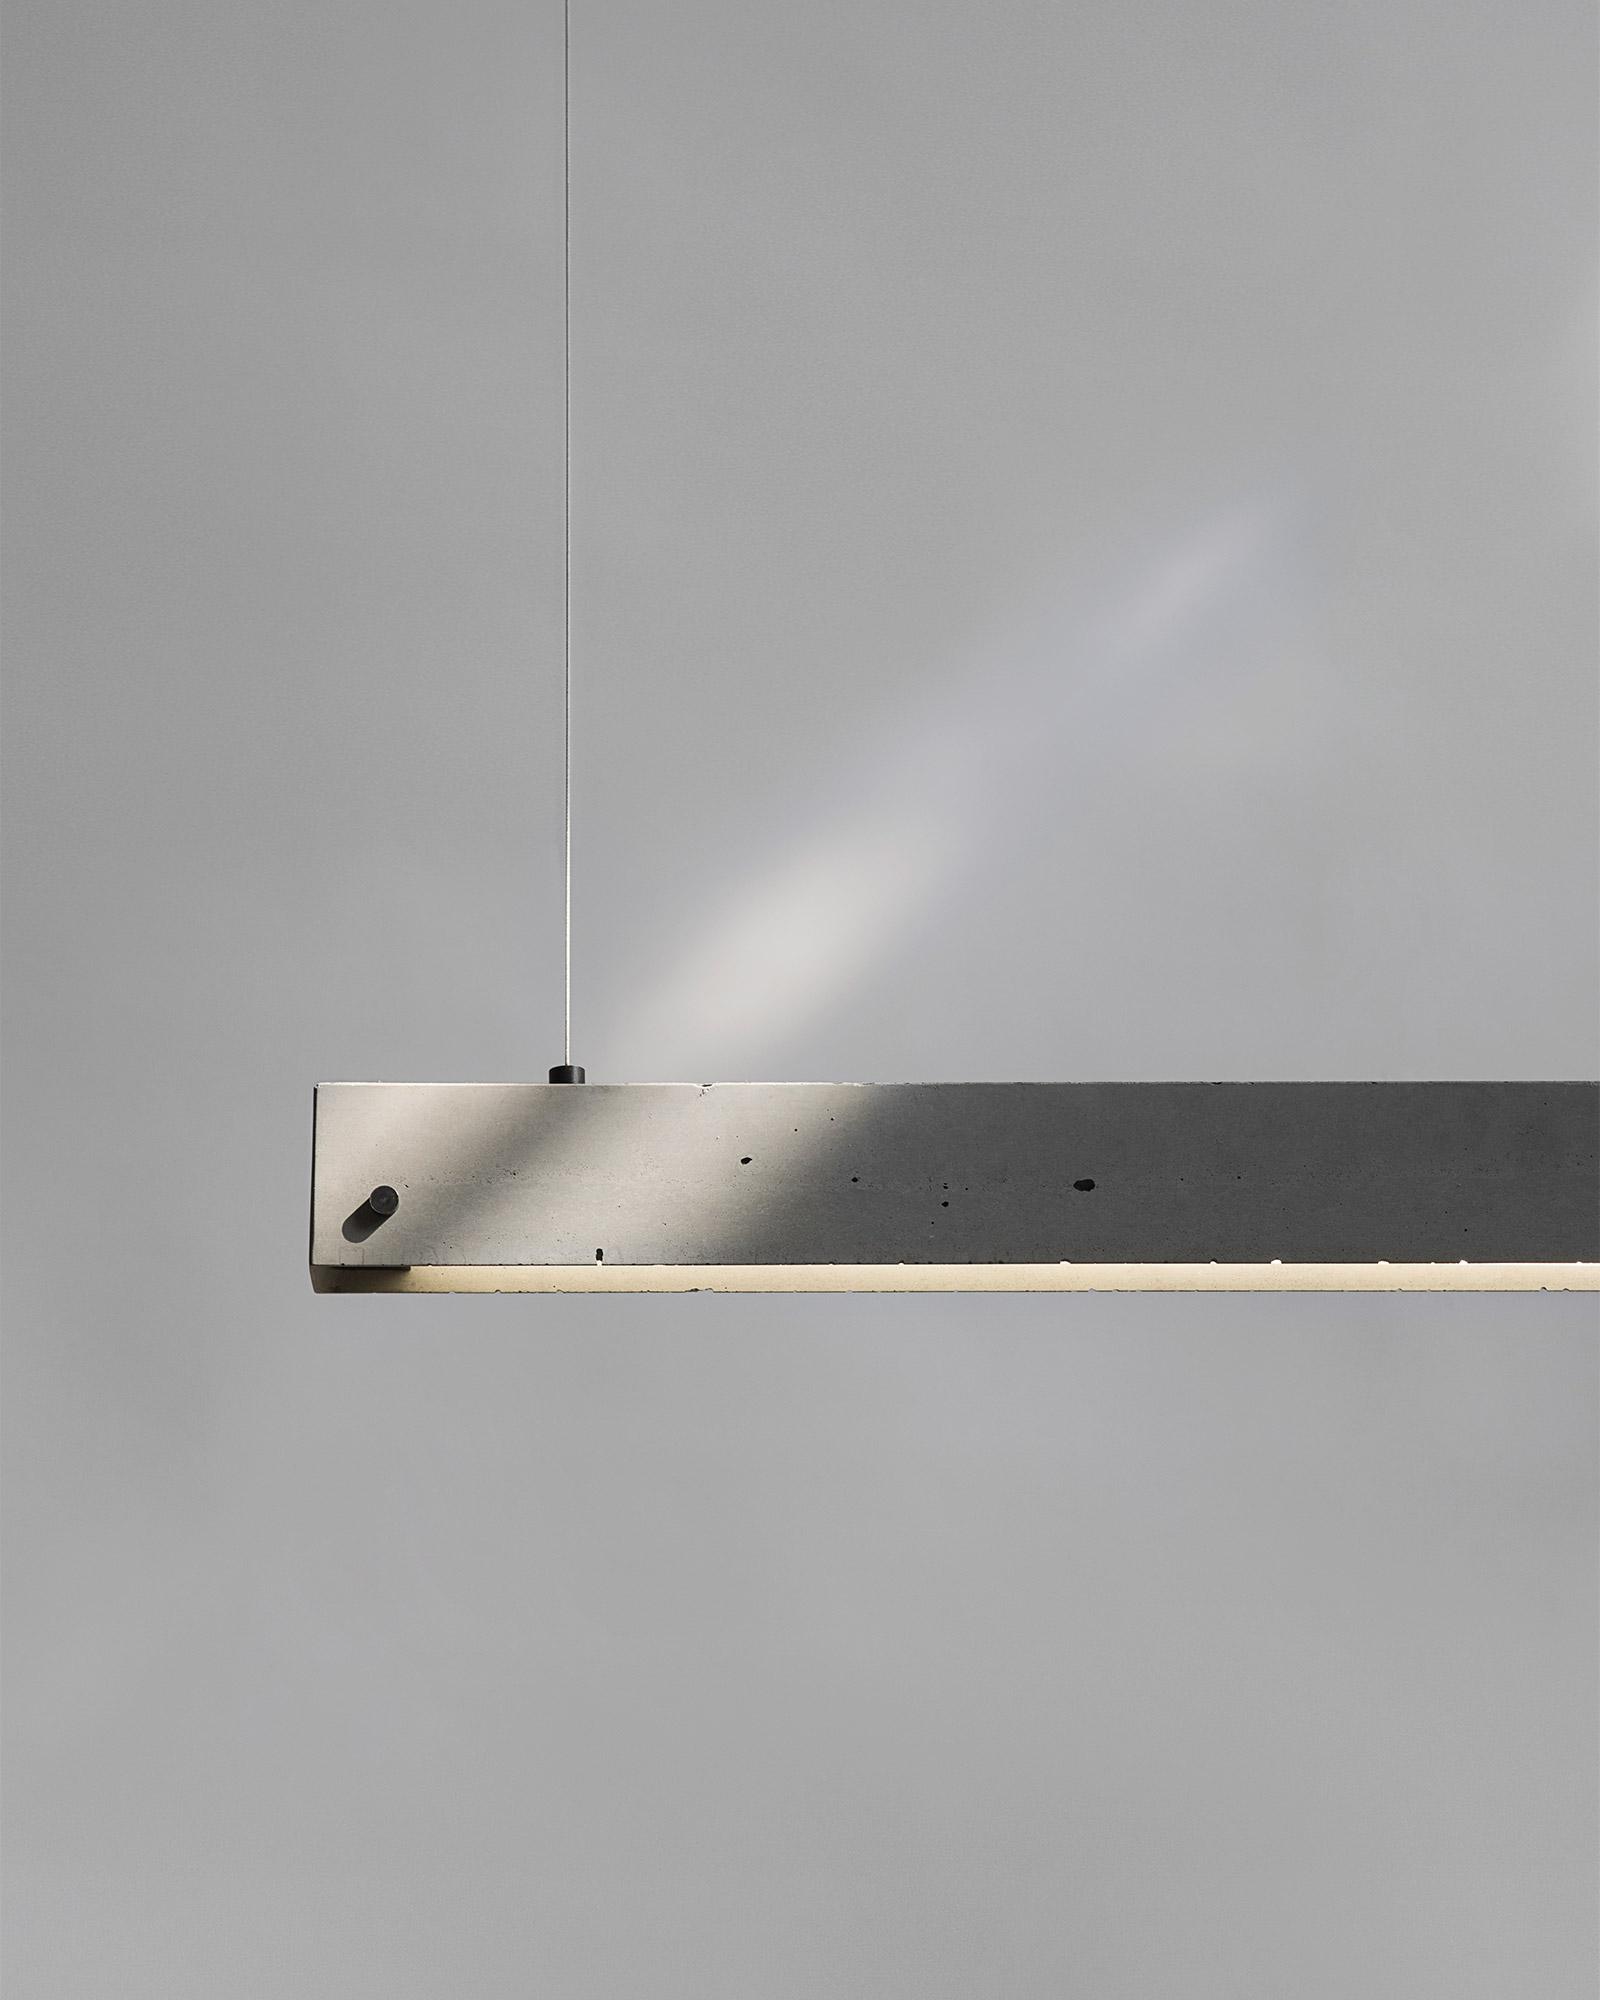 concrete pendant strip light on fine wires